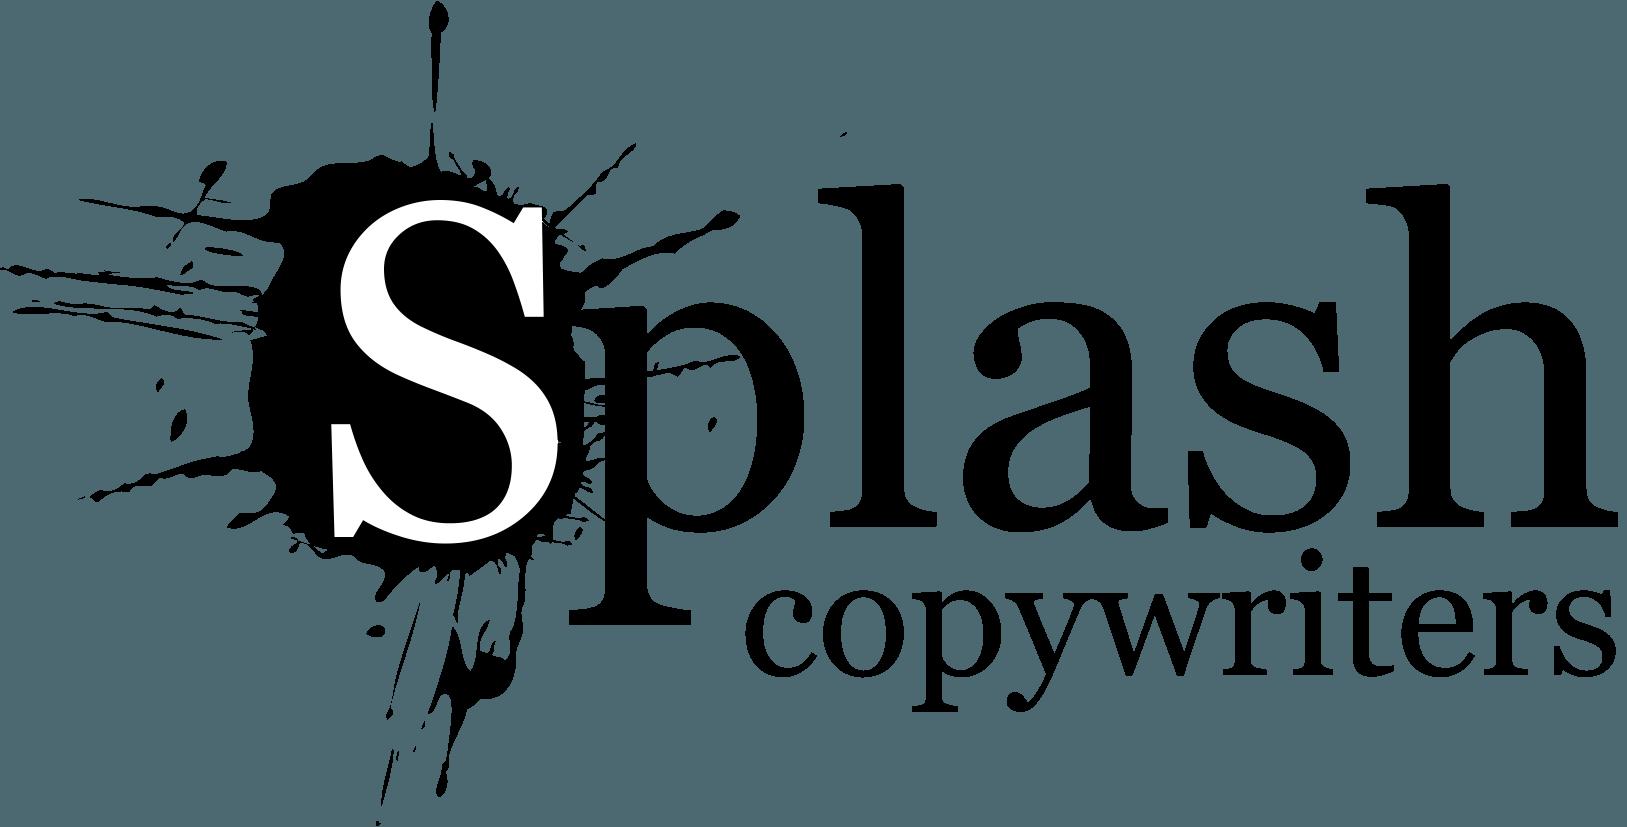 A dark version of the Splash Copywriters logo